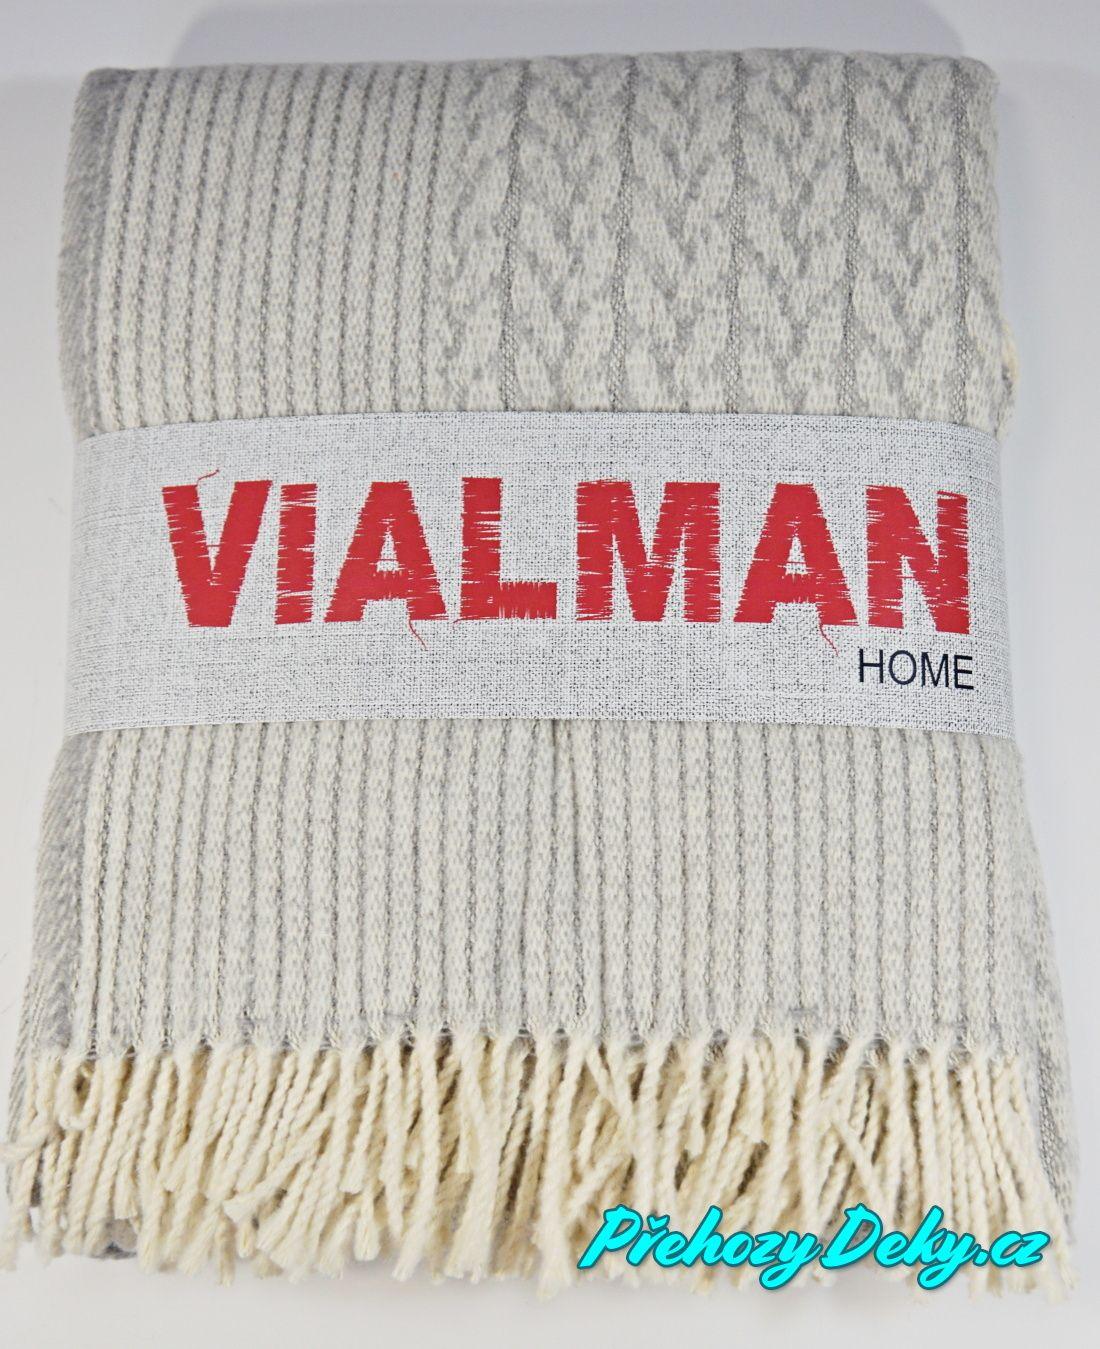 dámský pletený pléd Vialman